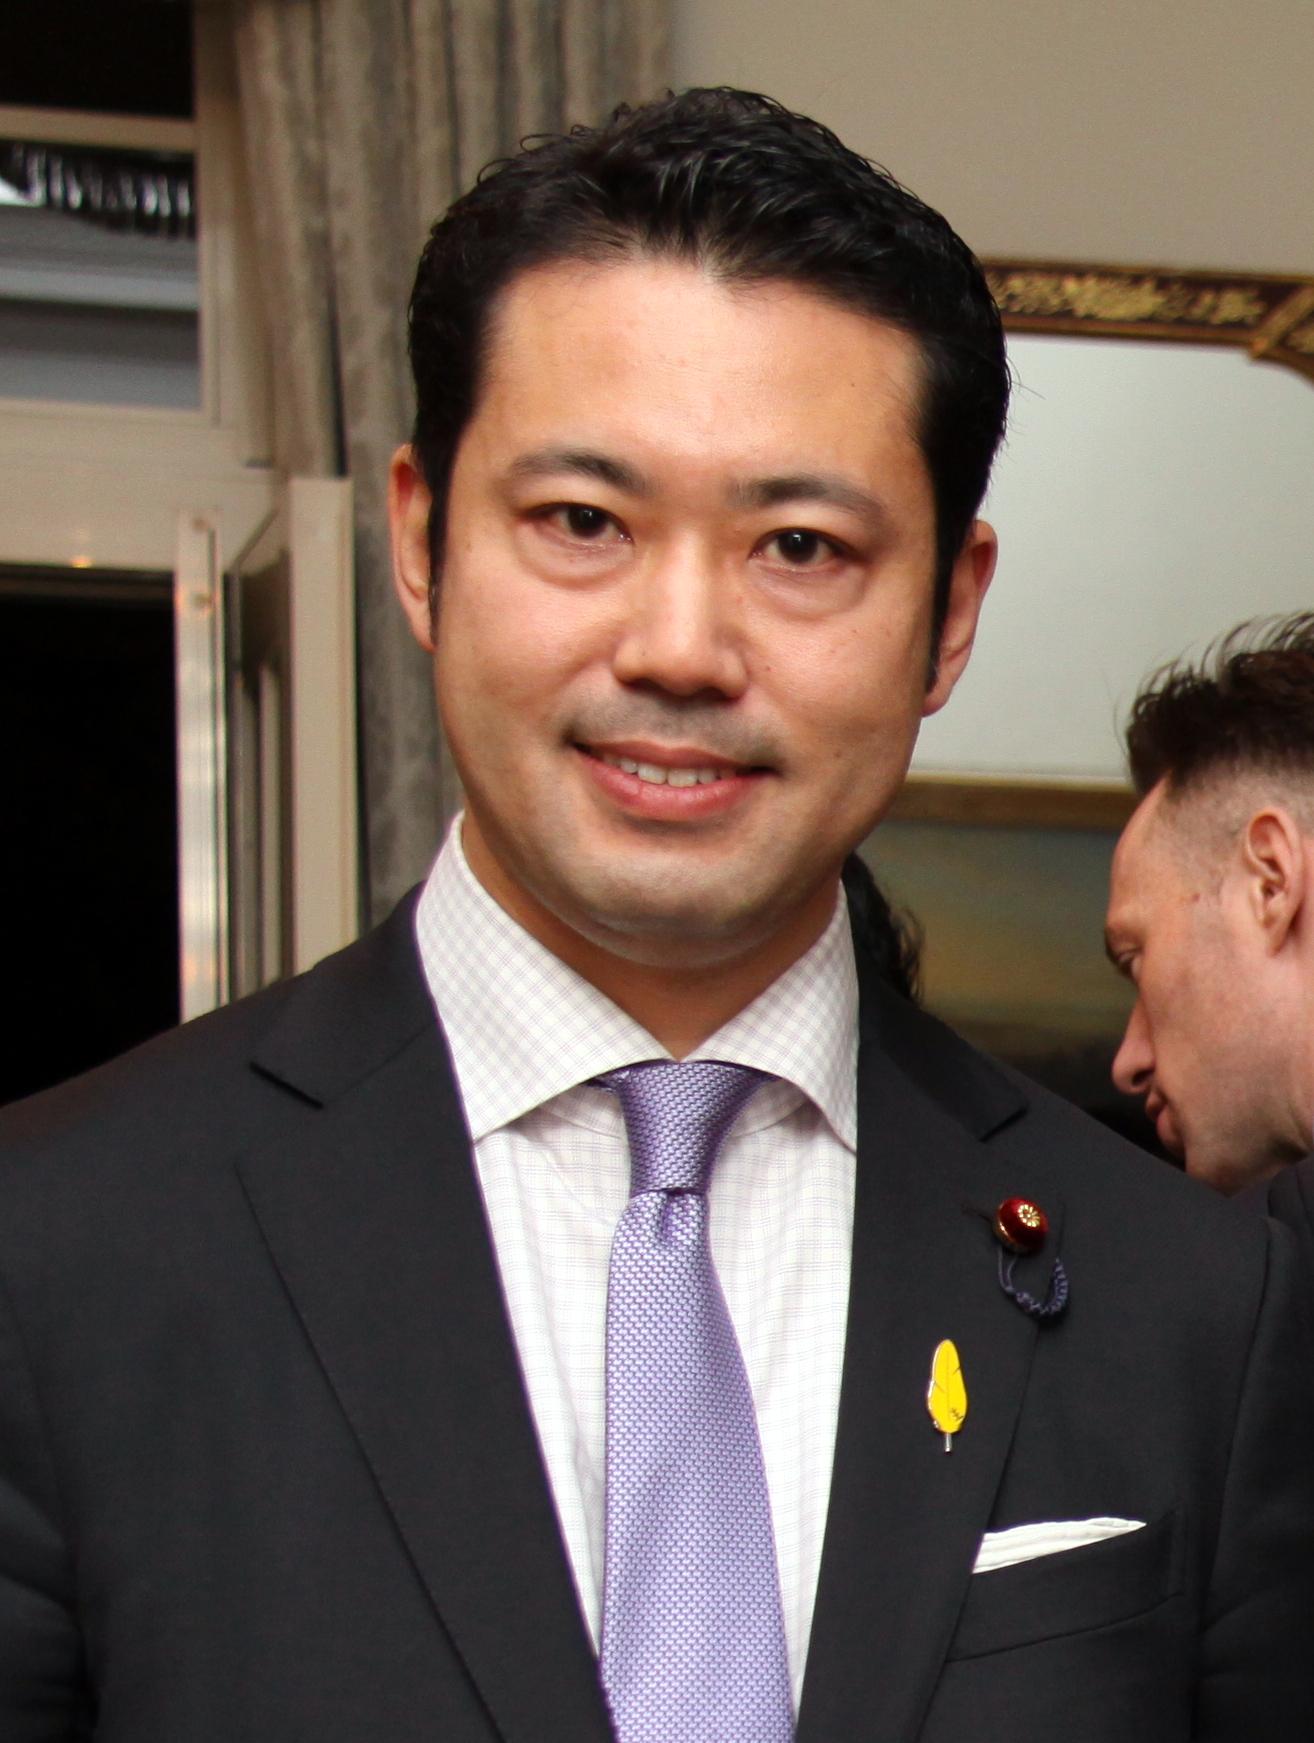 大塚拓 - Wikipedia